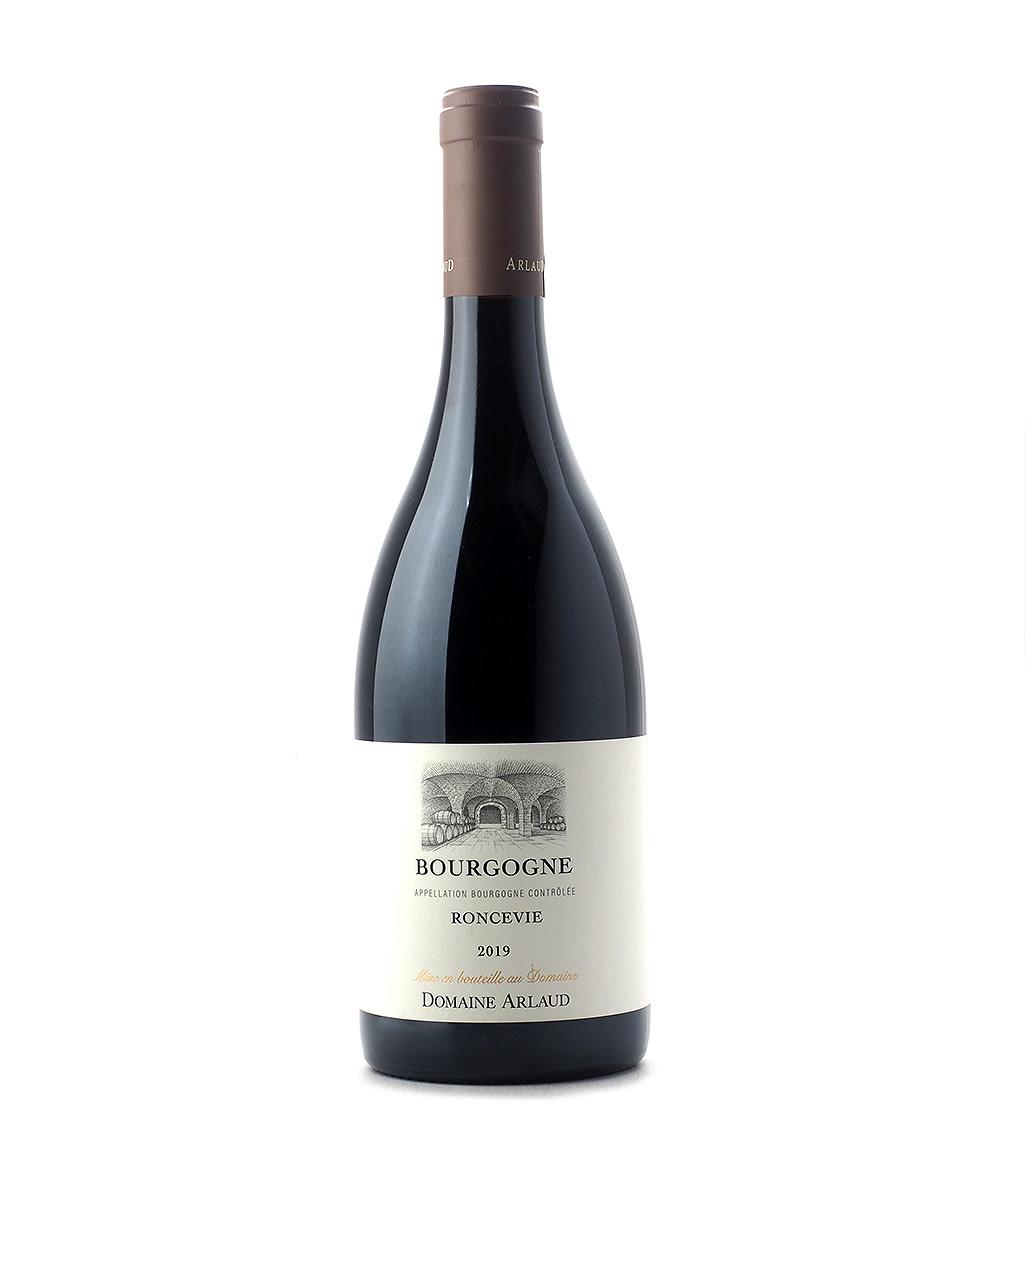 Domaine Arlaud Bourgogne Roncevie 2019